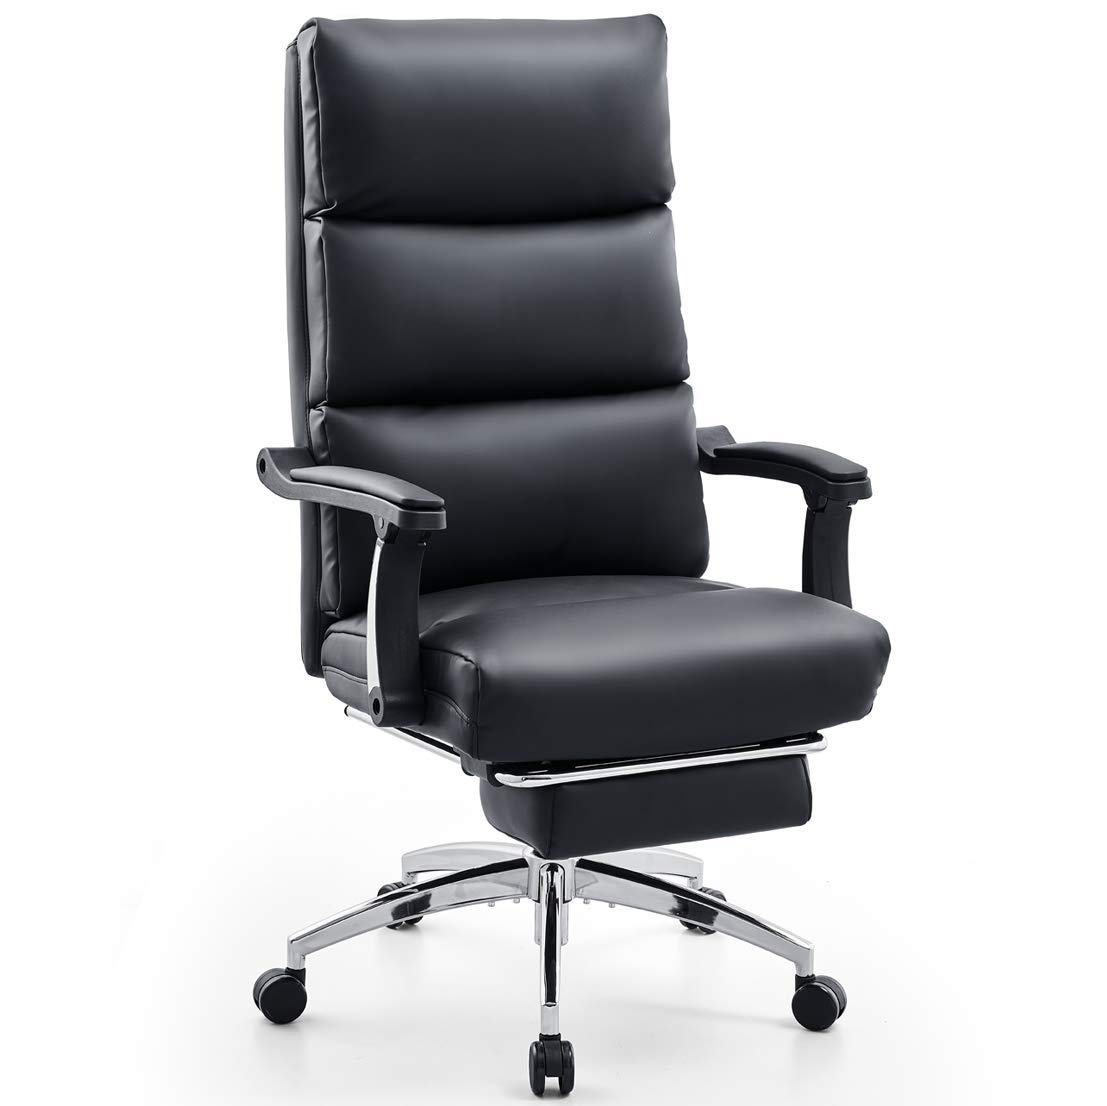 Ticova Executive Office Chair Reclining